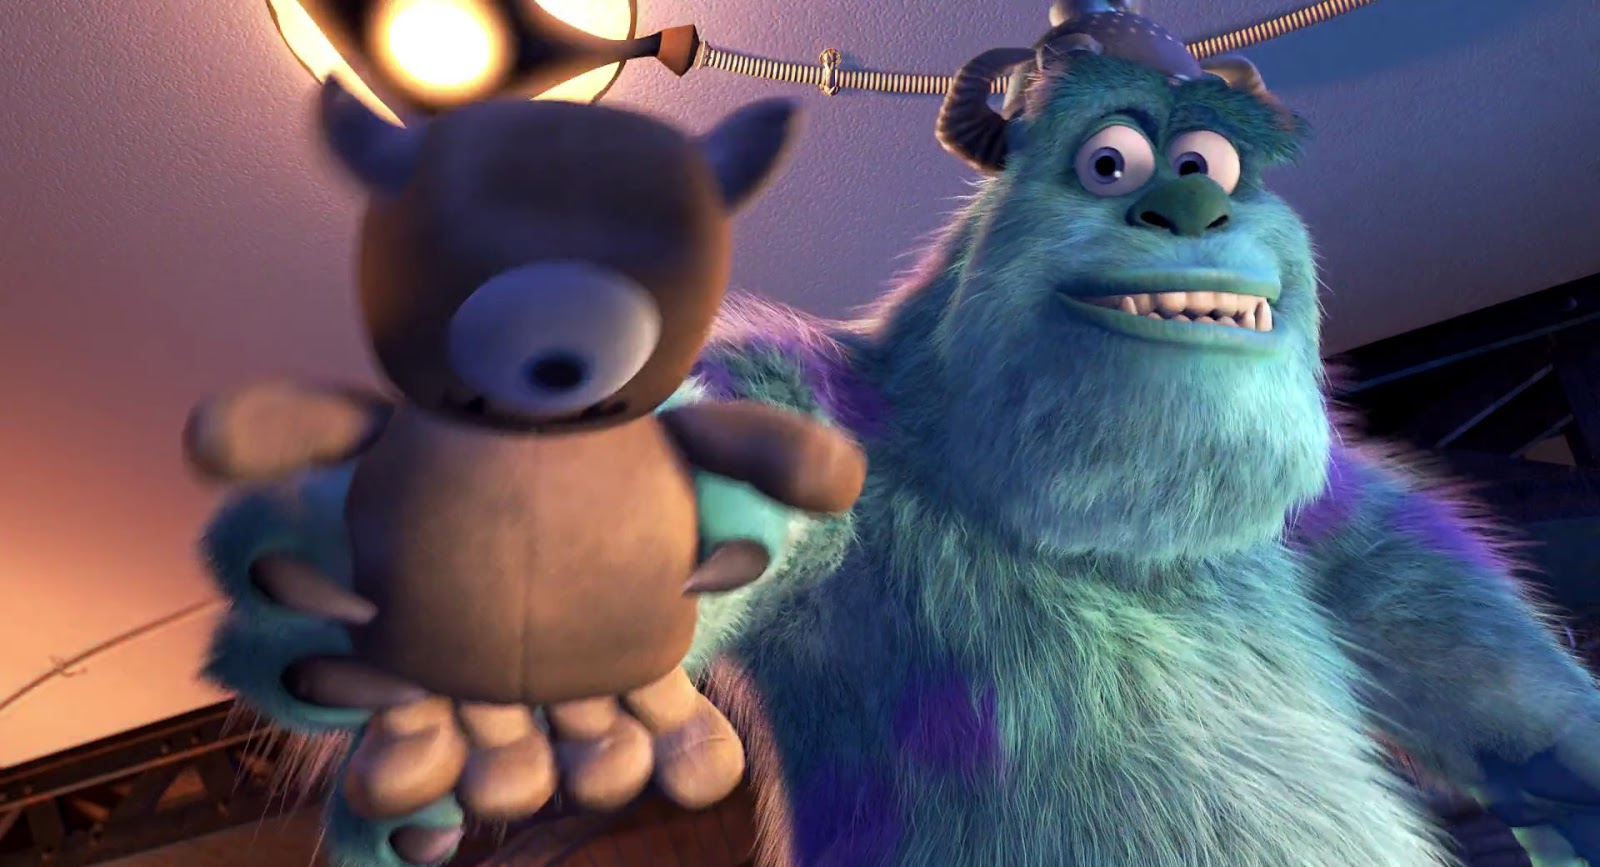 Sulley. Monsters Inc, 2001.©Disney/Pixar.